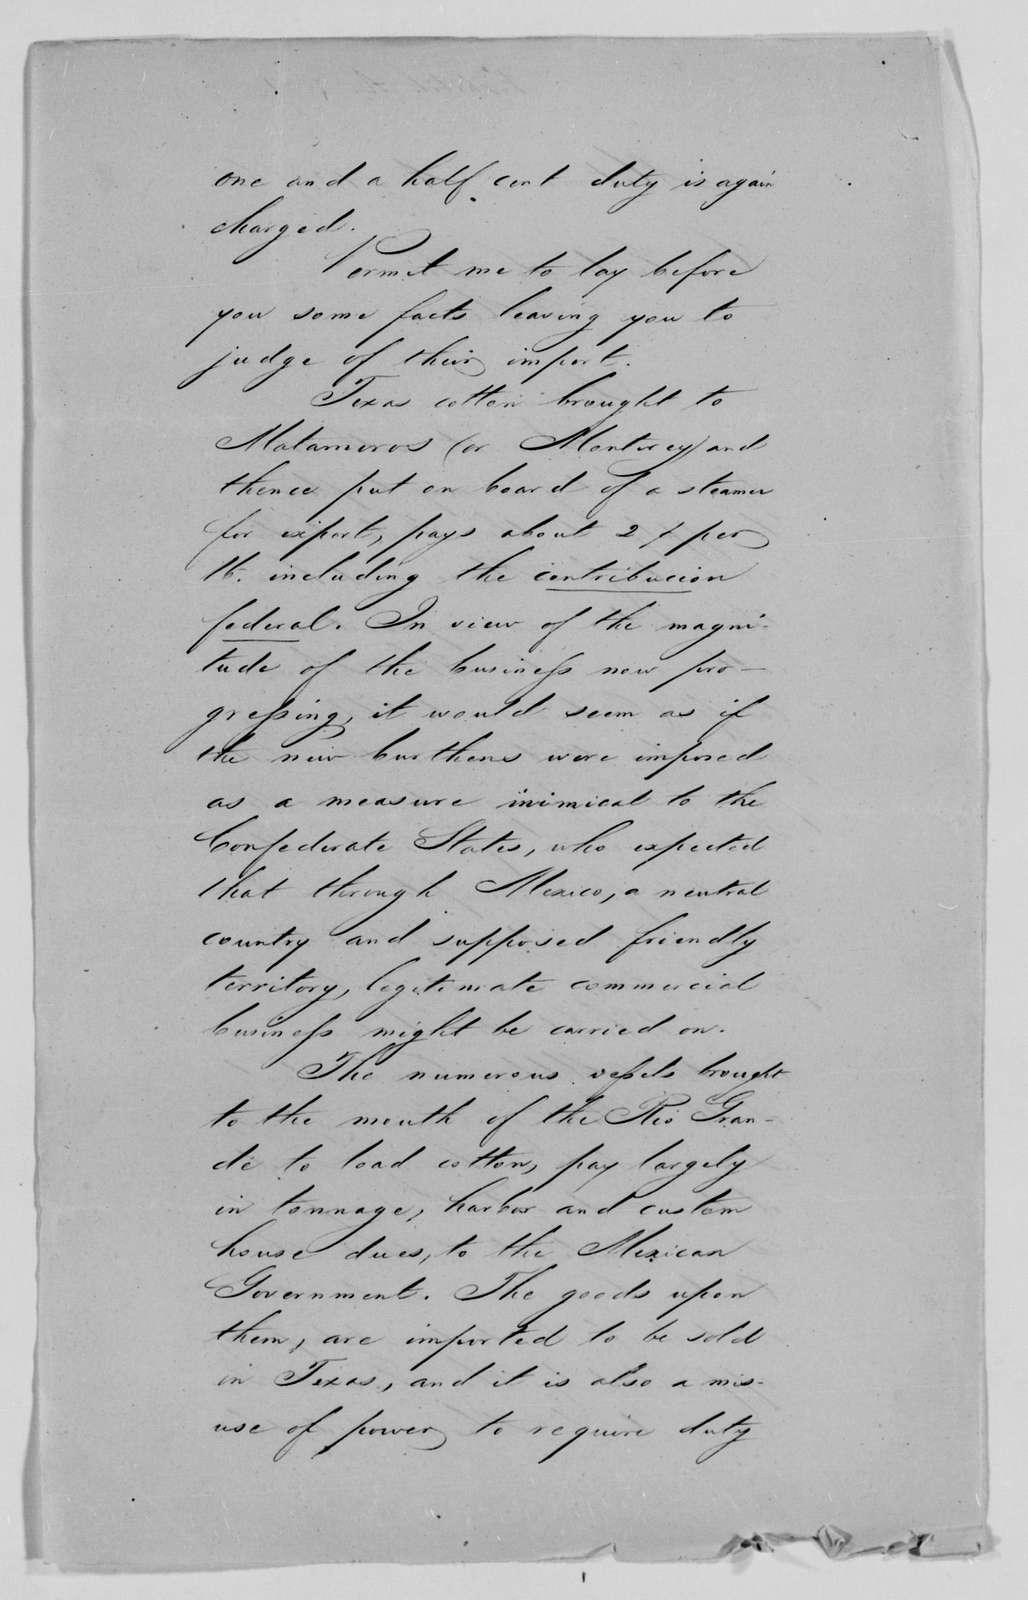 Confederate States of America records: Microfilm Reel 8